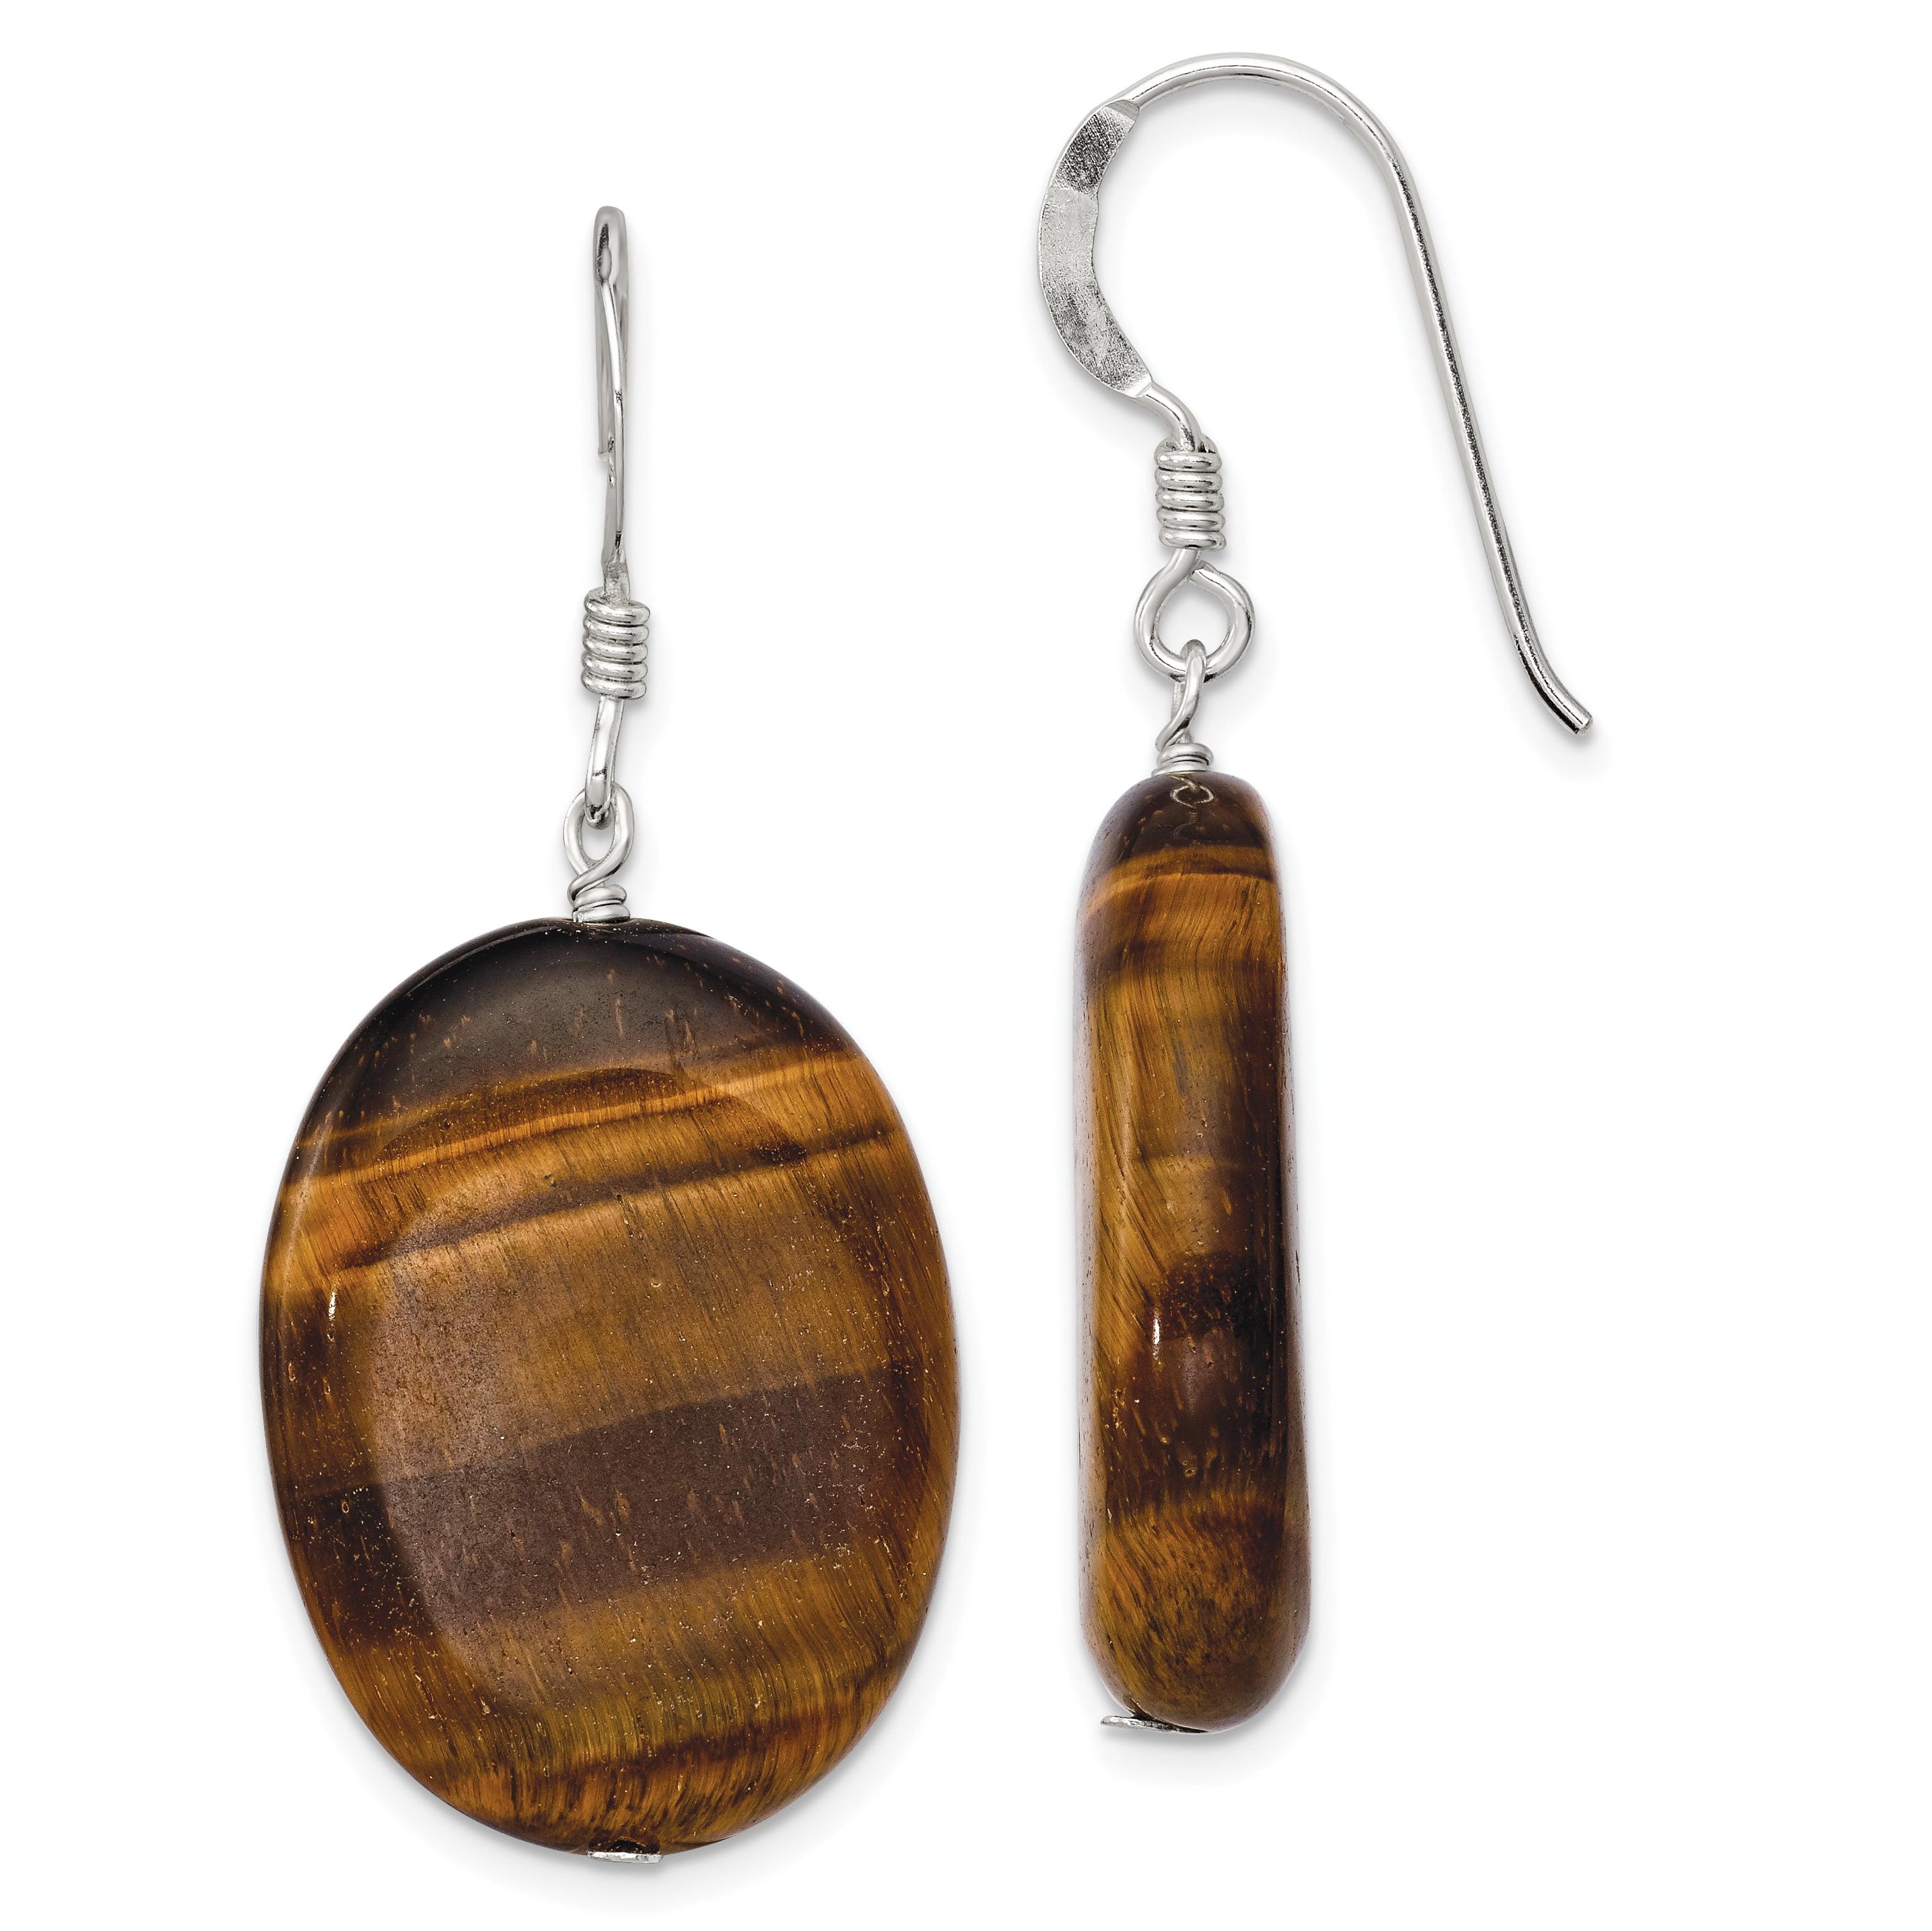 925 Sterling Silver Tigers Eye Drop Dangle Chandelier Earrings Fine Jewelry Gifts For Women For Her - image 2 of 2